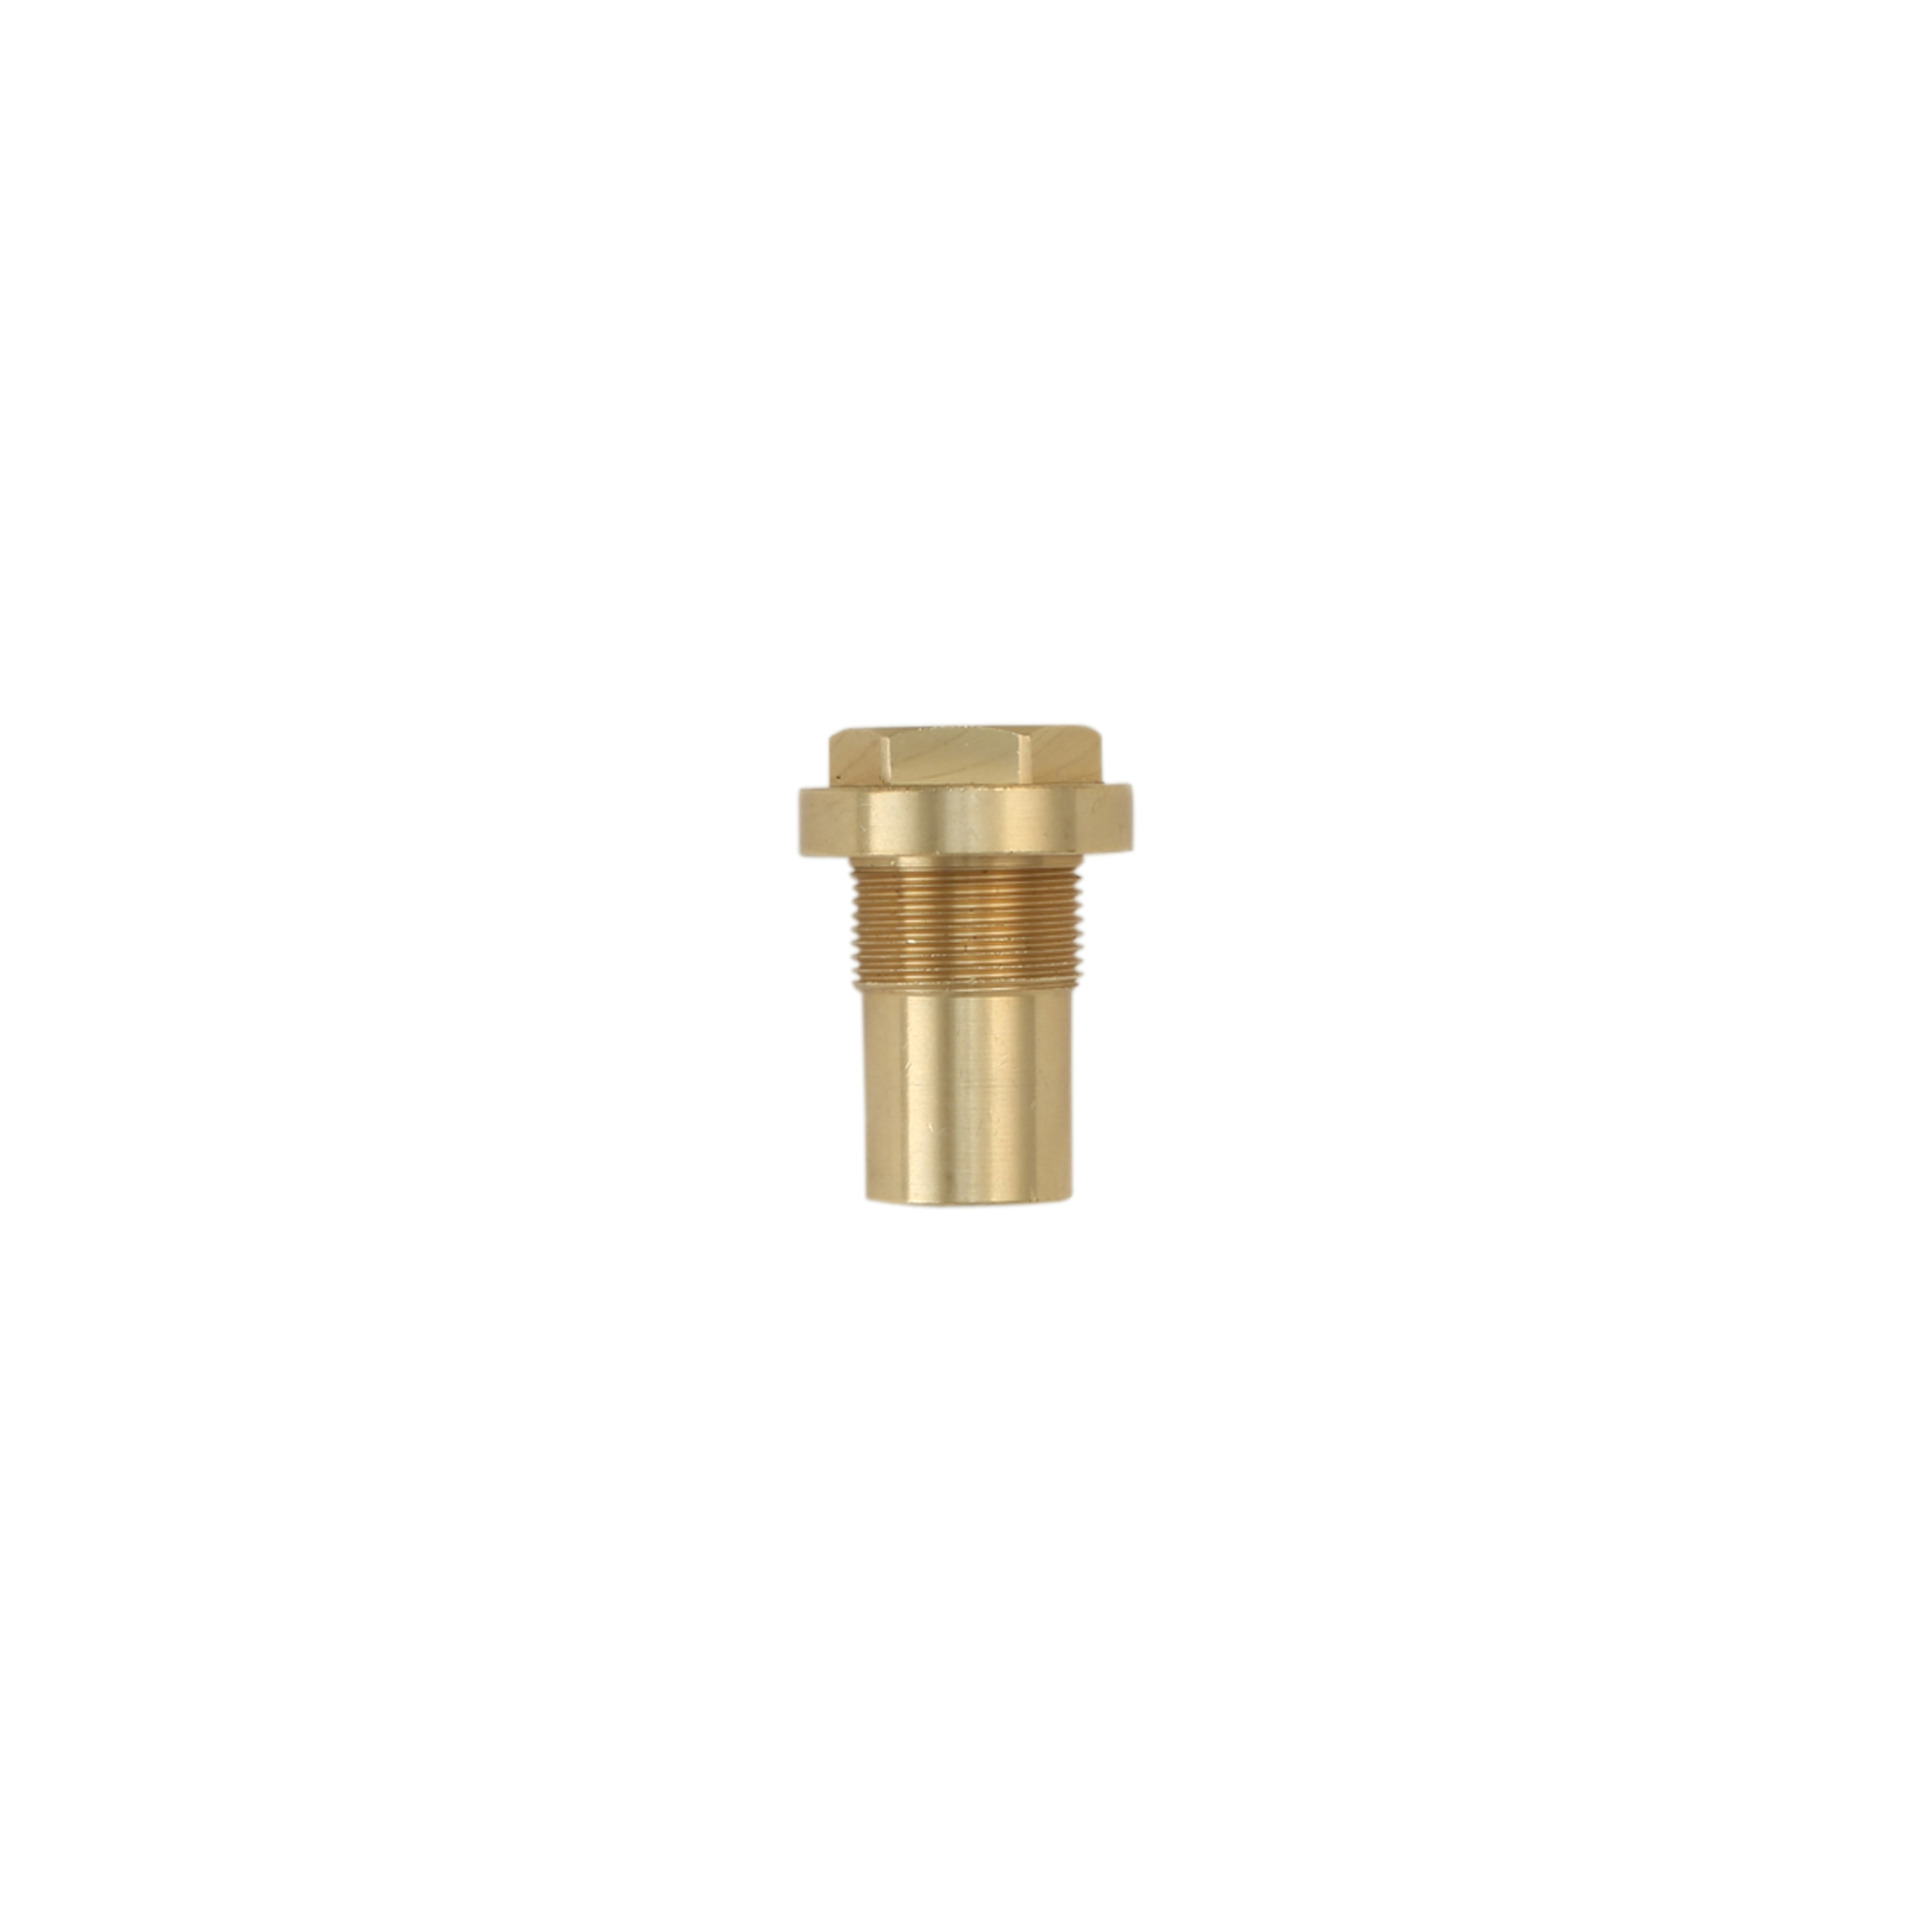 American Standard Bathtub Faucet Repair Instructions 11k 5c Cold Stem for American Standard Tub Shower Faucets